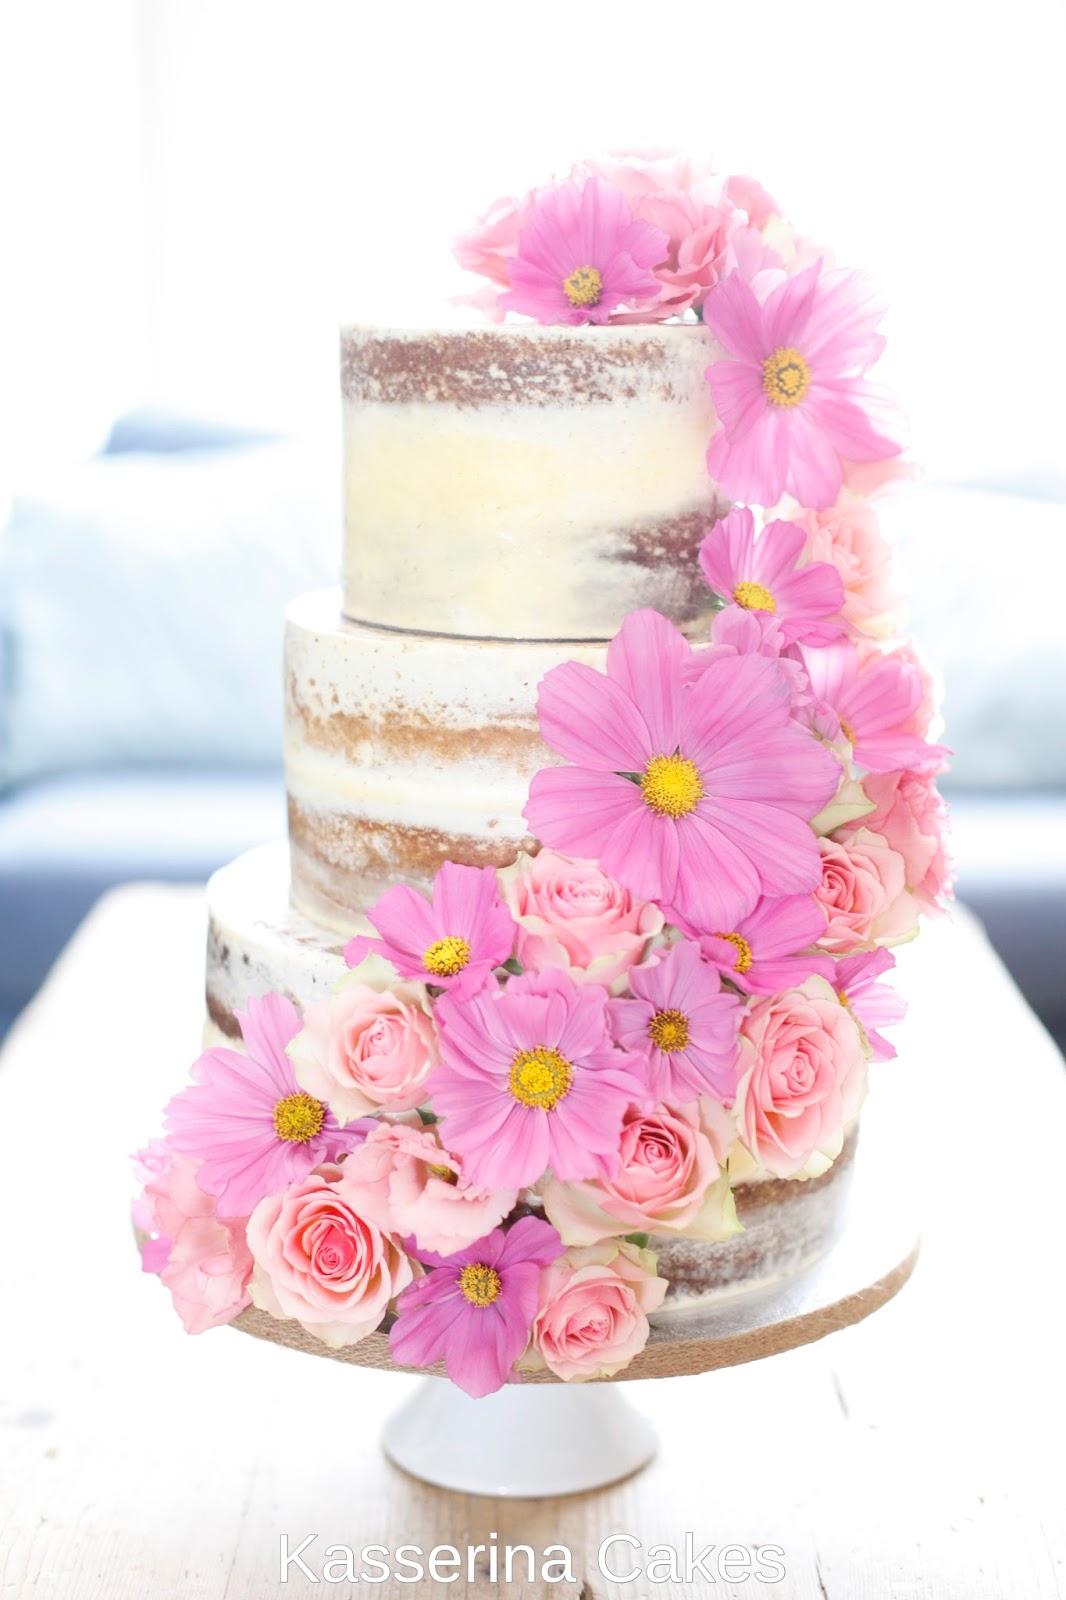 Kasserina: Rustic semi-rustic cake with fresh flowers - June 2016